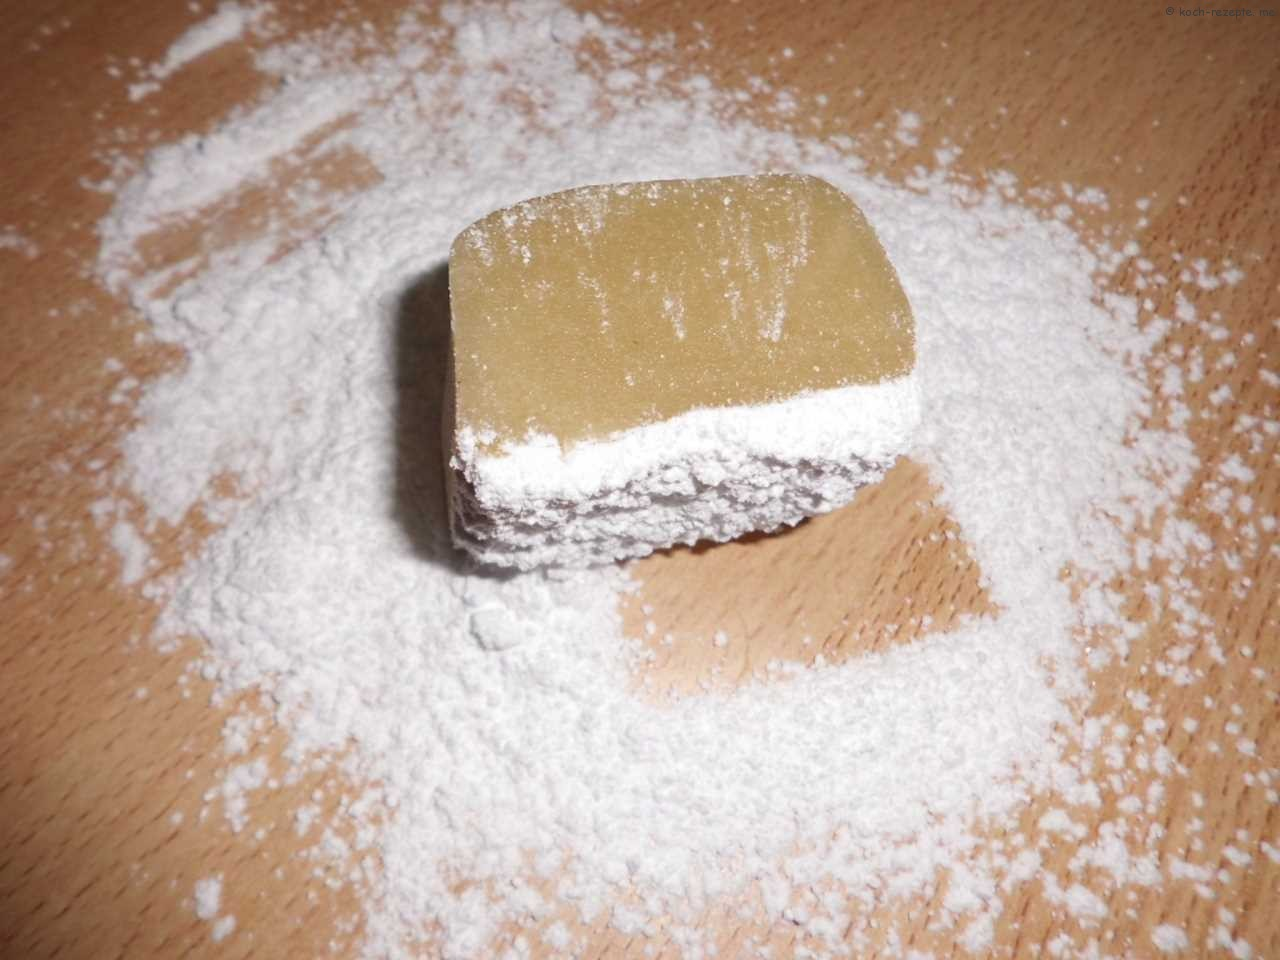 Marzipanrohmasse mit Puderzucker verkneten